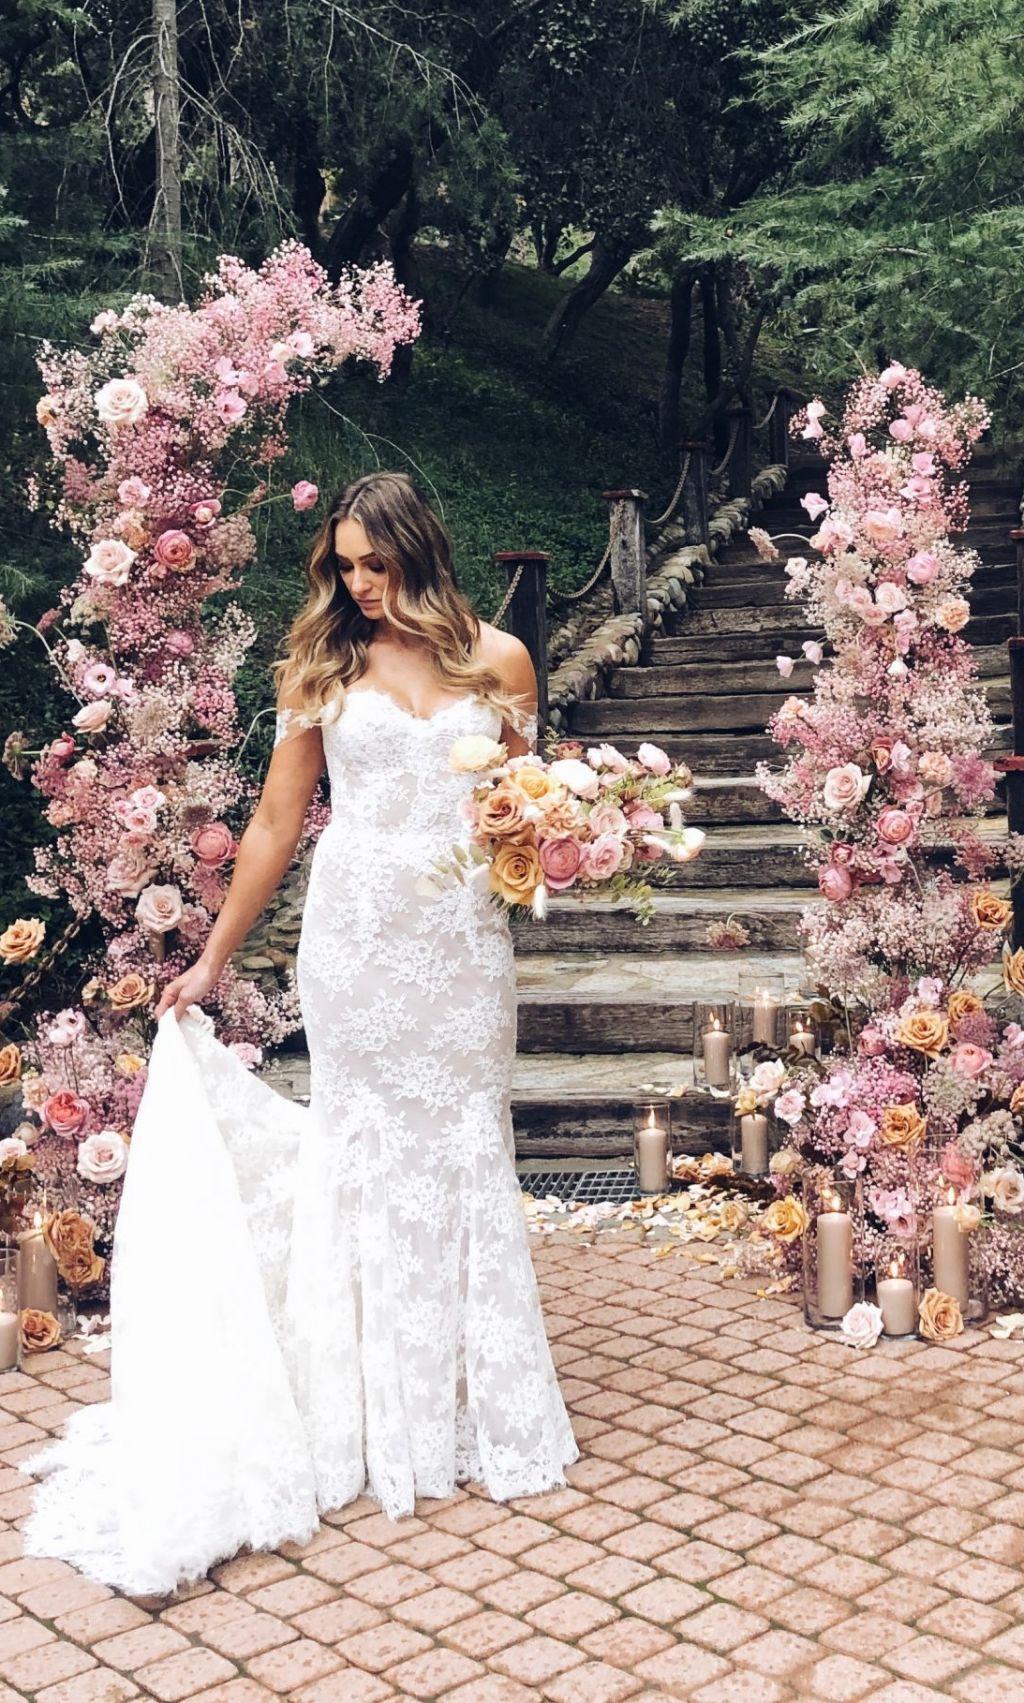 Monique Lhullier - designer wedding dresses for less on PreOwnedWeddingDresses.com